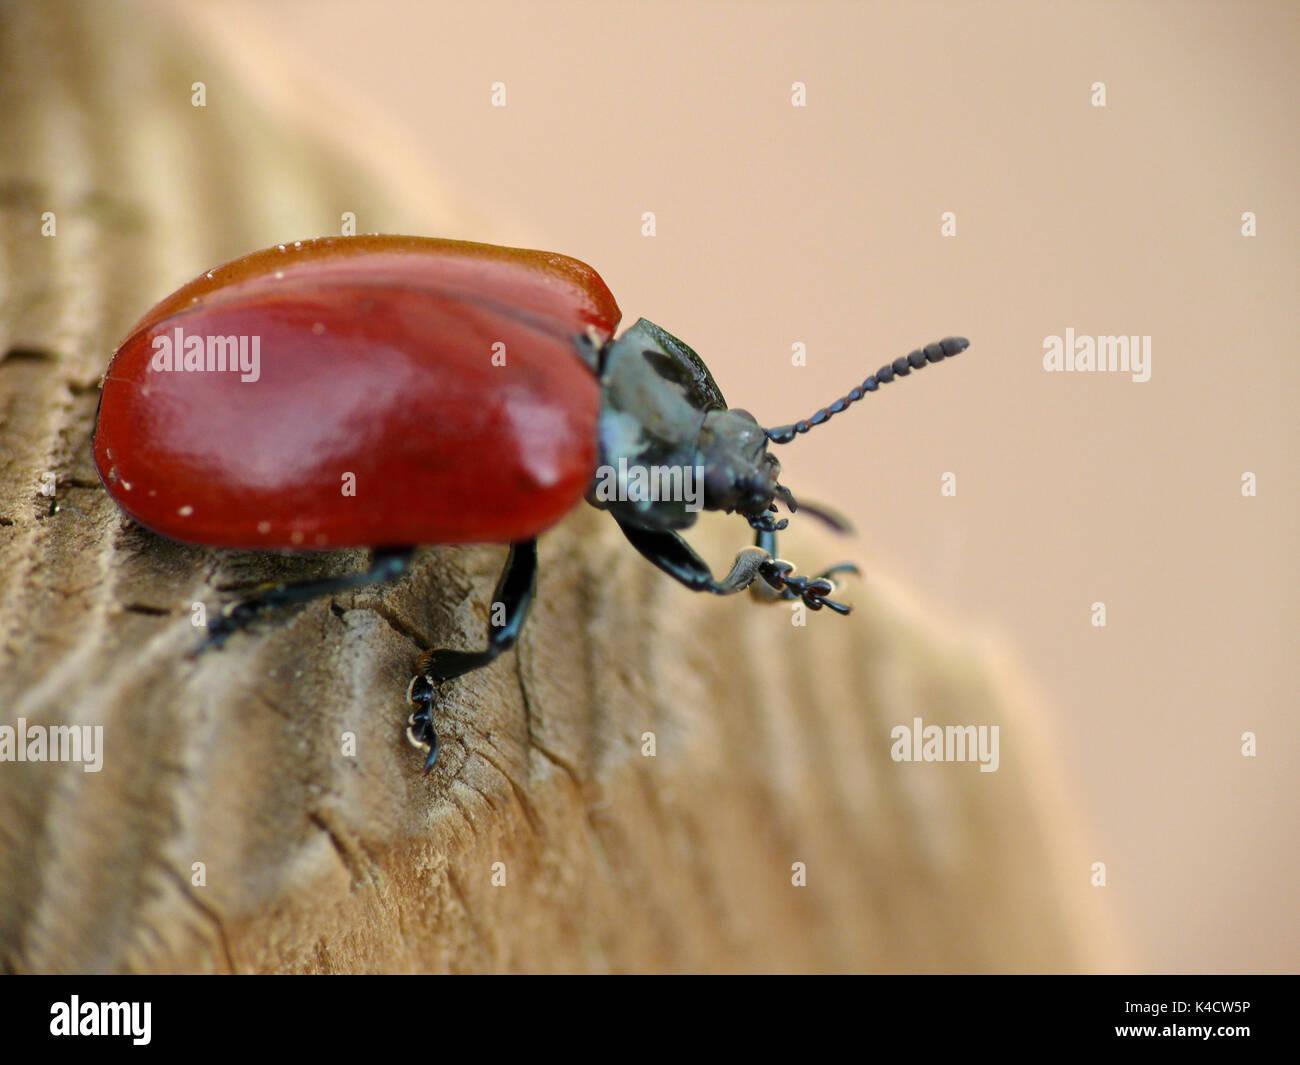 Red Poplar Beetle, Melasoma Populi, Found On Poplars And Pastures - Stock Image